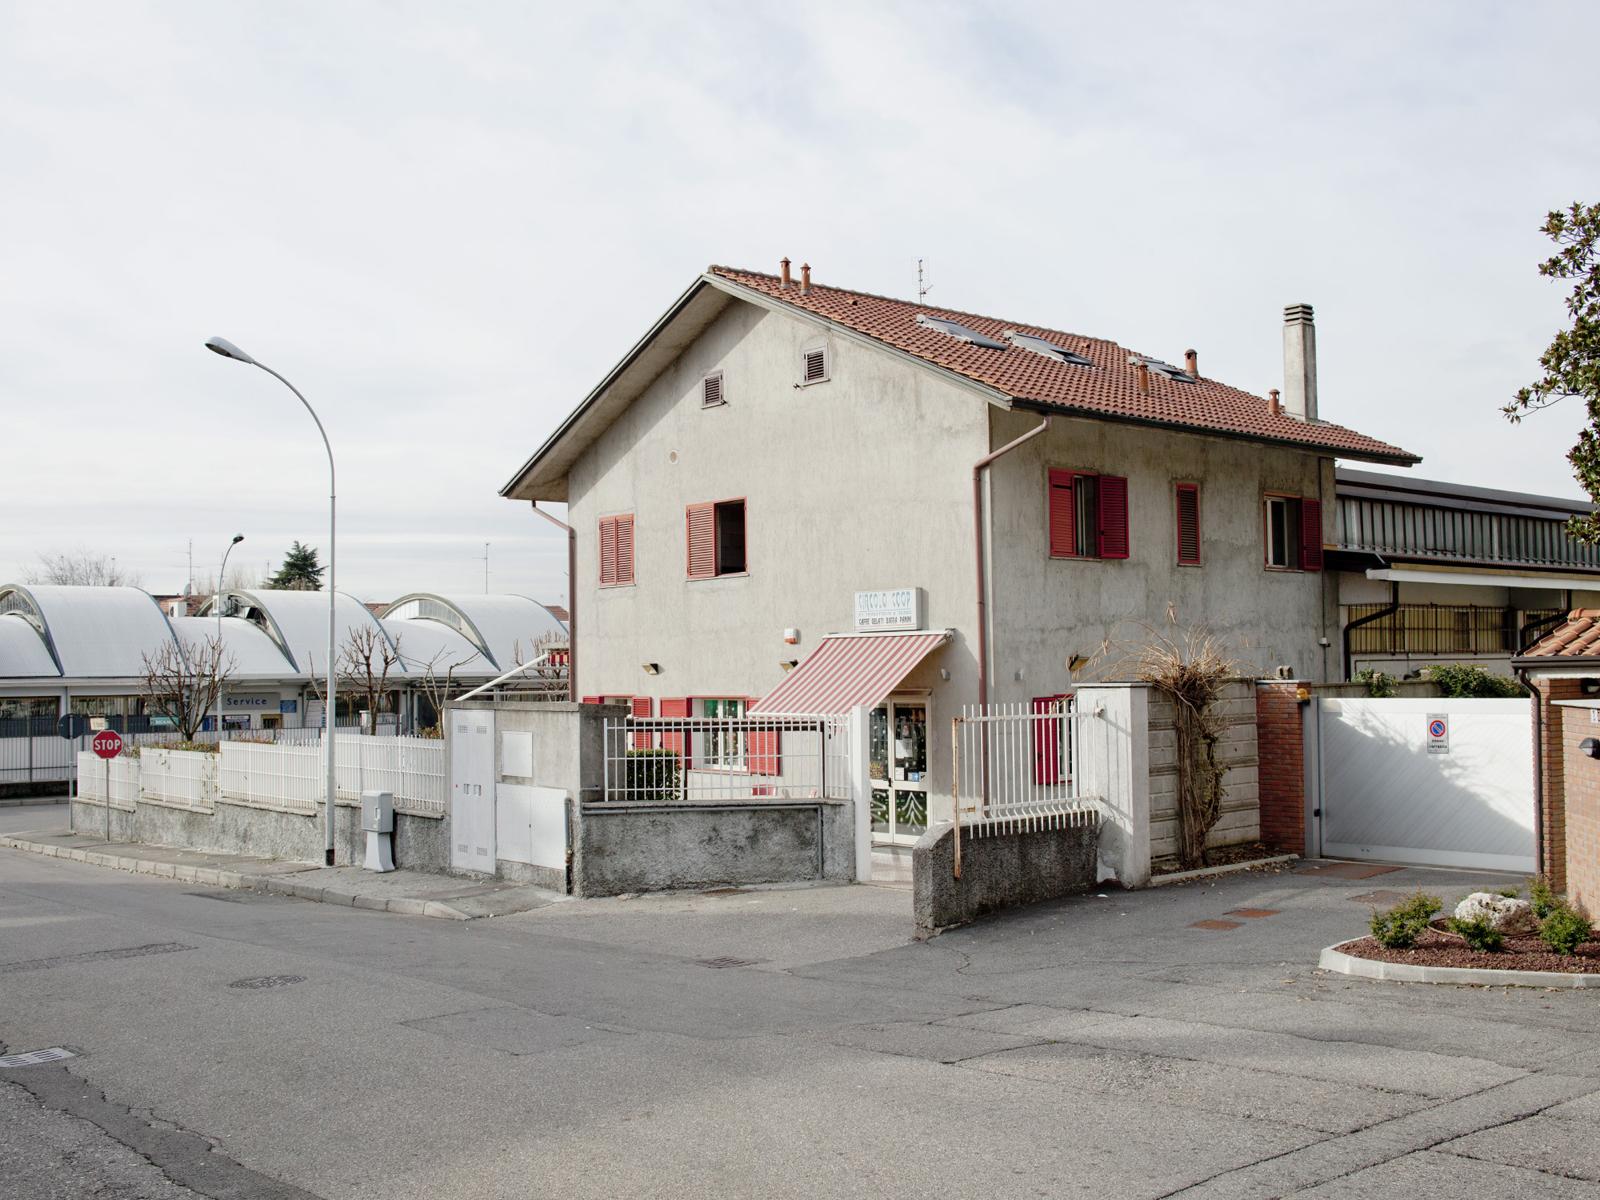 Ex-Servicemen and Veterans' Co-operative Club, San Vittore Olona, Milan, 2012